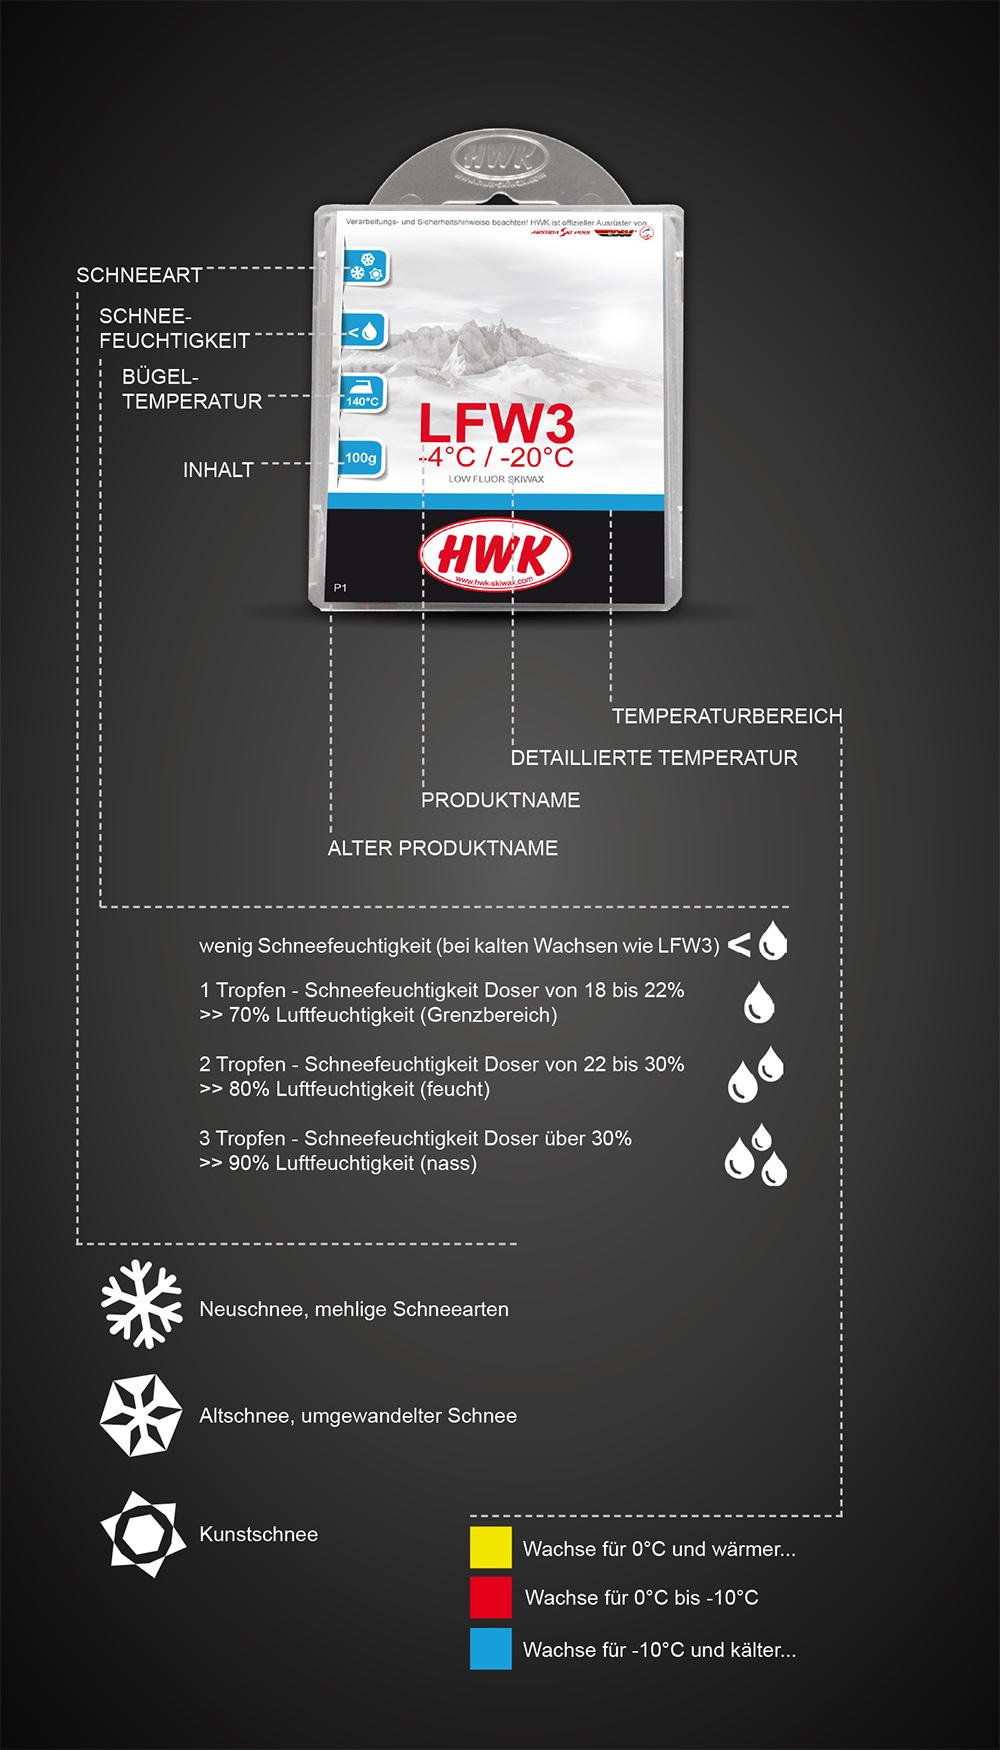 produktdesign-hwk_skiwachs